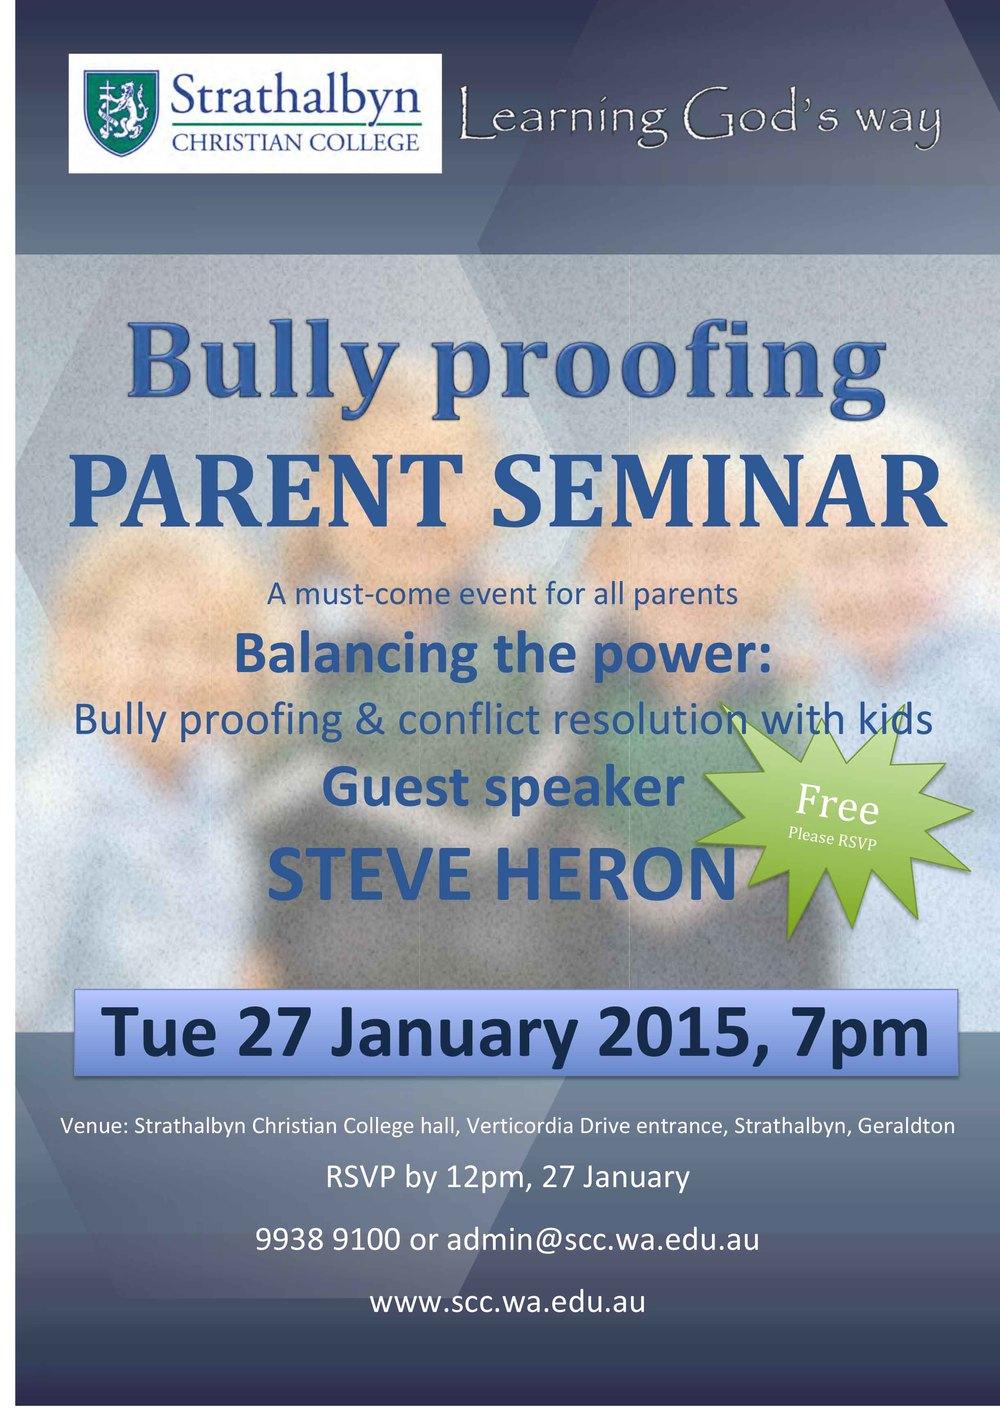 Microsoft Word - Bully proof seminar 270115.docx